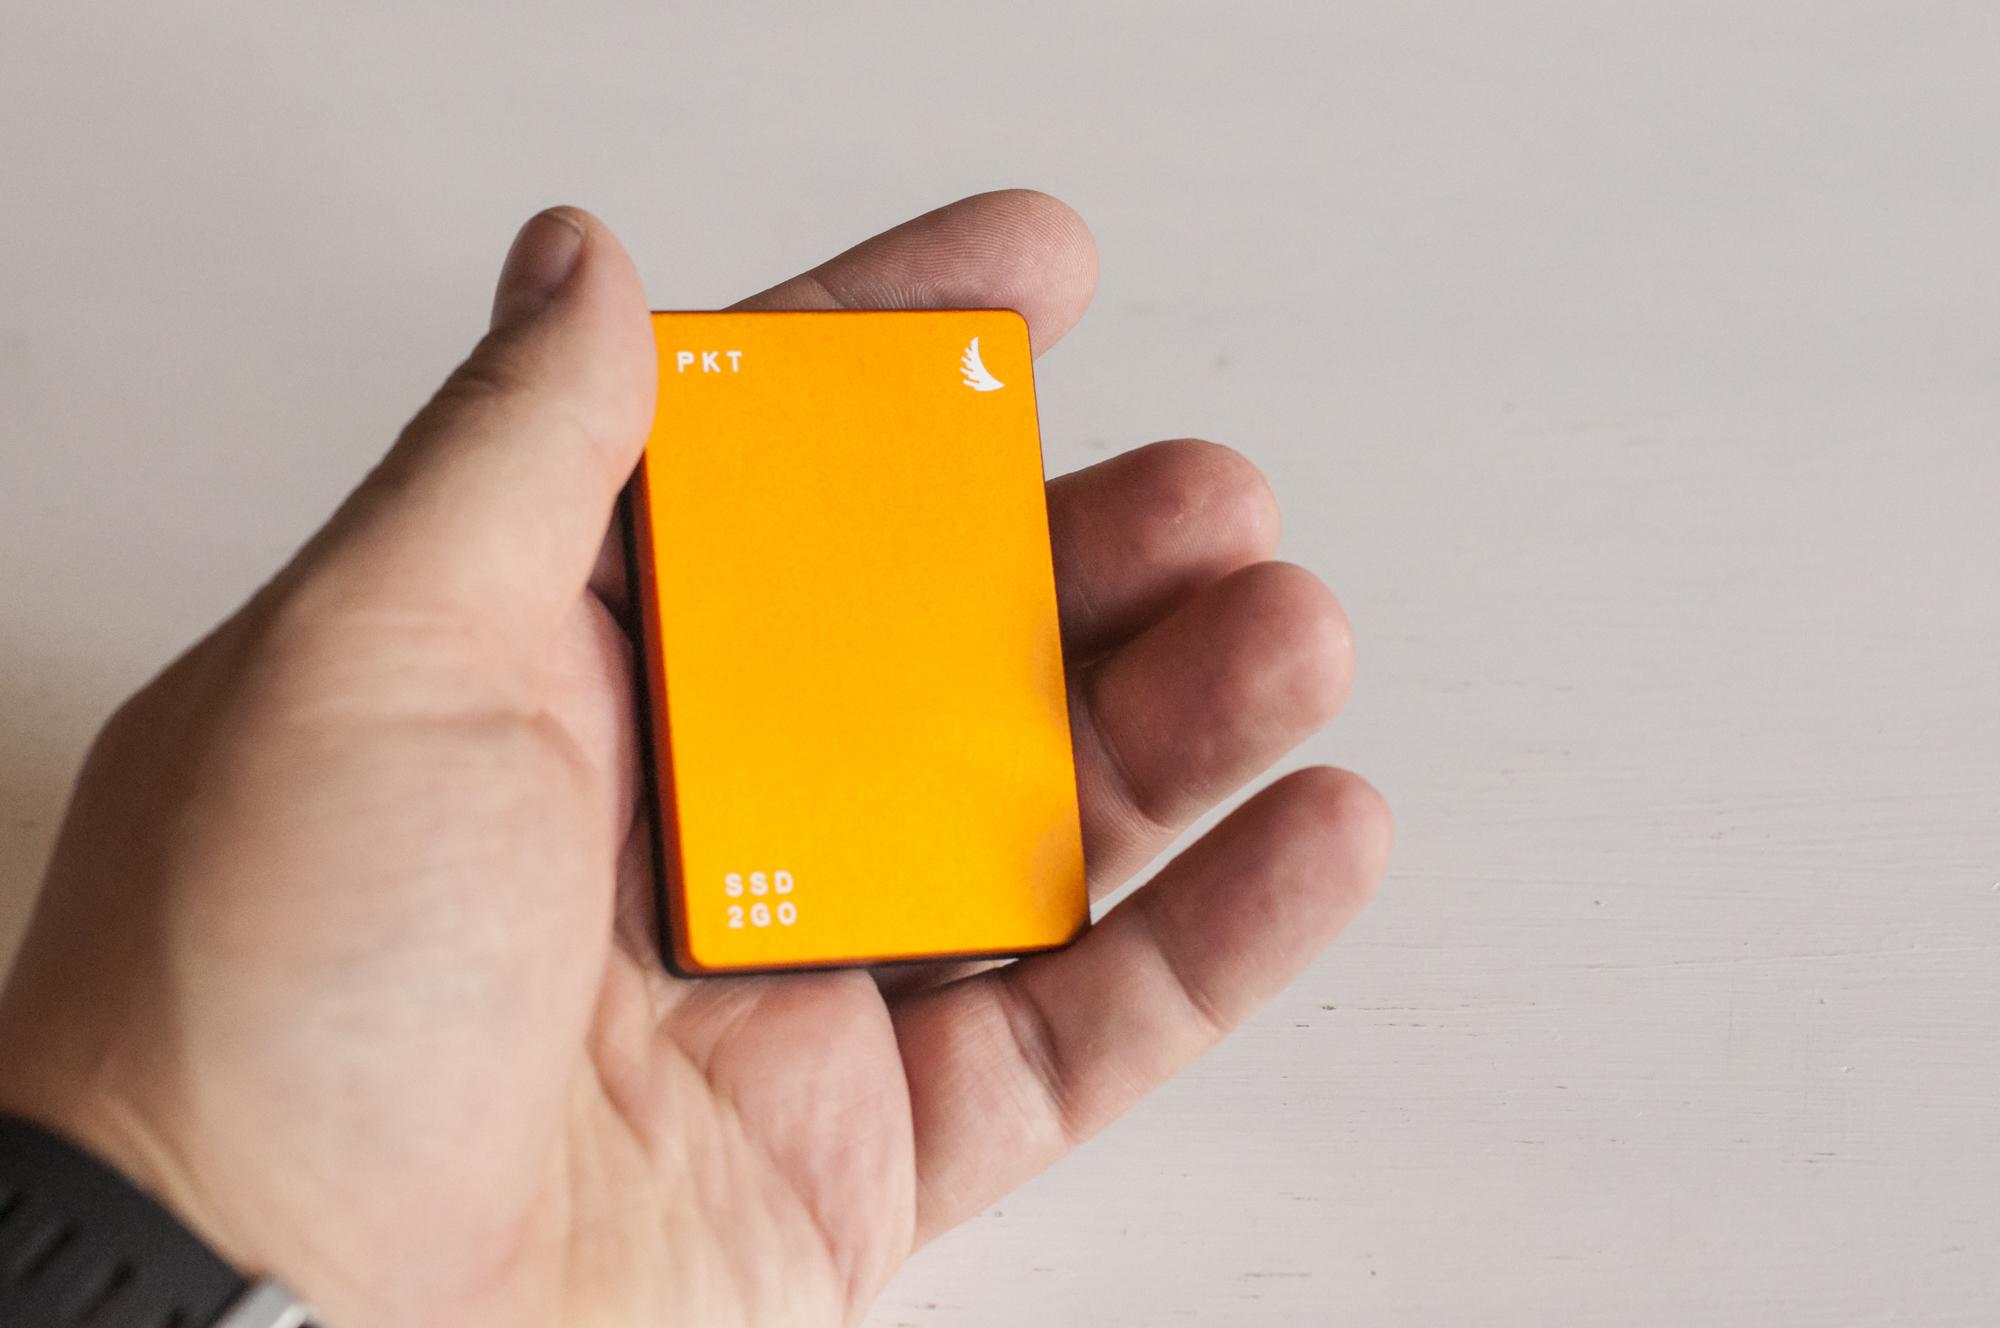 I migliori Hard Disk portatili